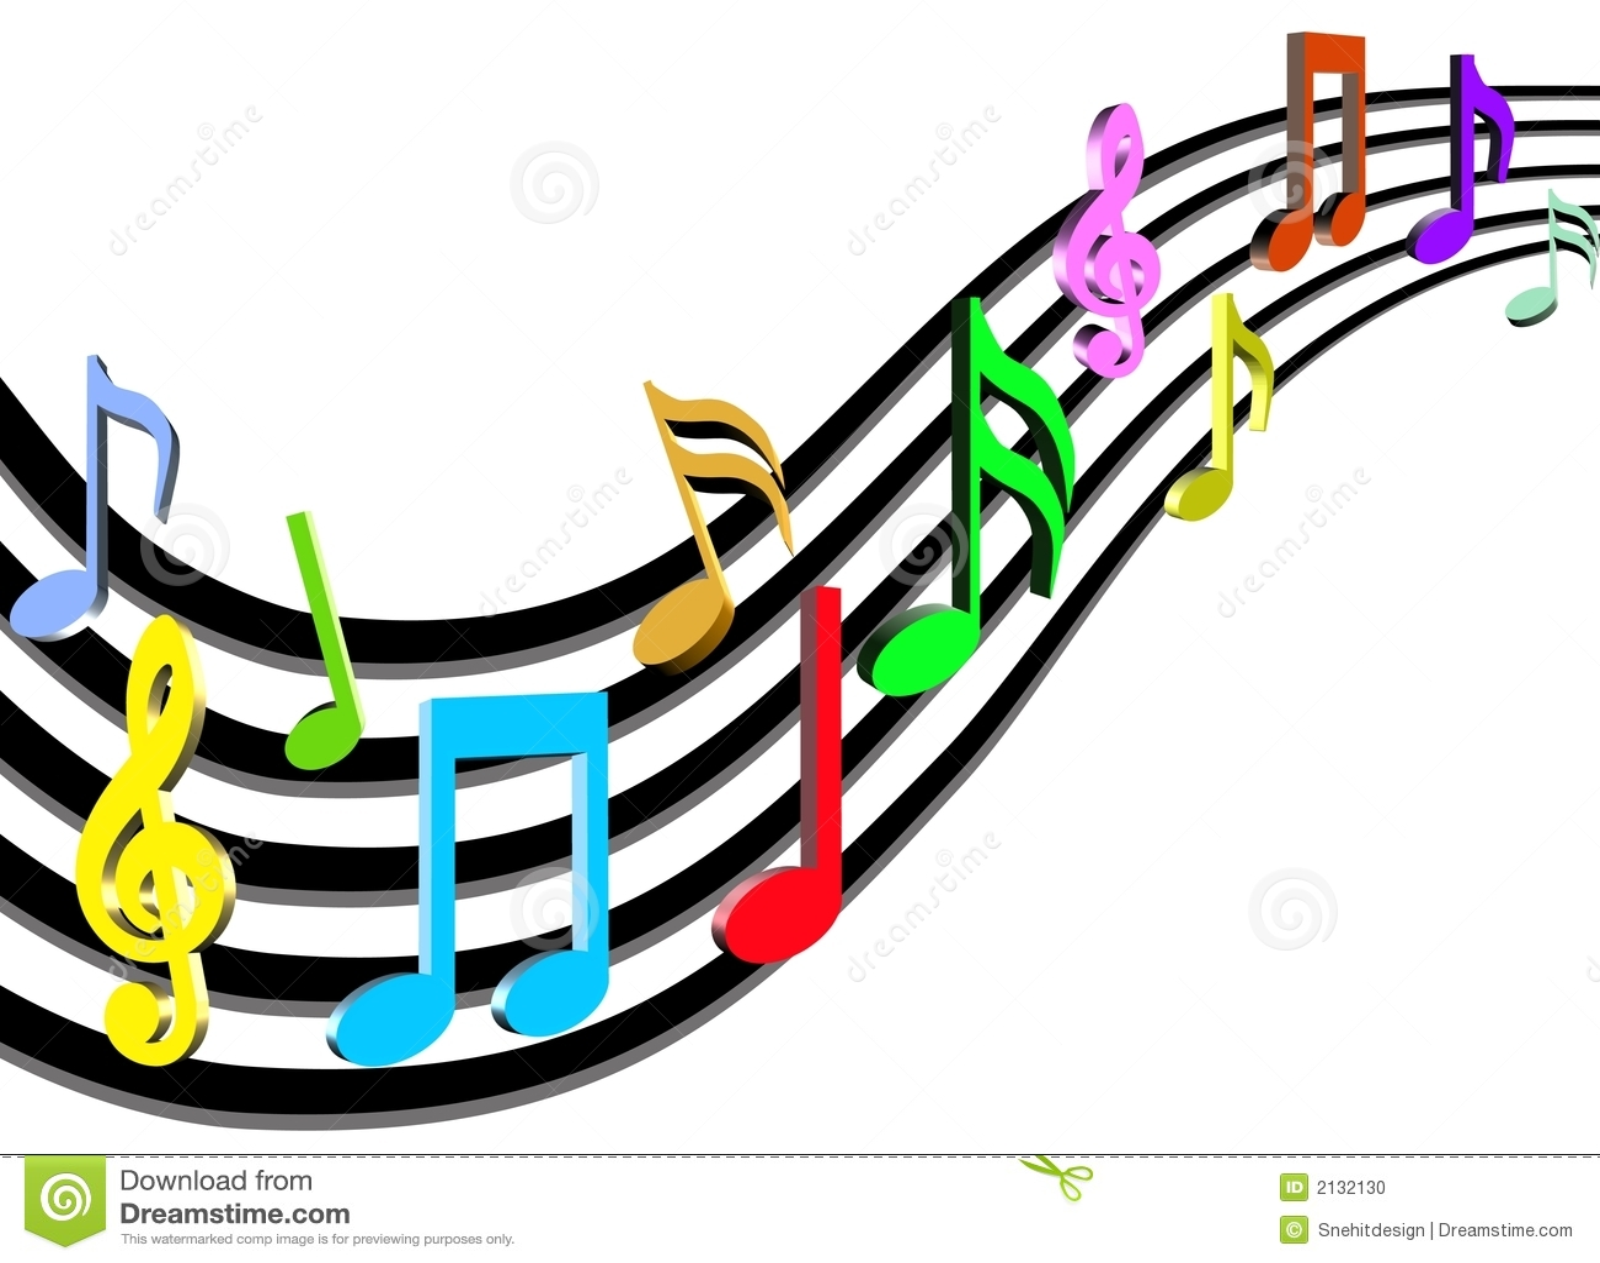 Super Music notes stock illustration. Image of score, flat, sharp - 2132130 ZO72